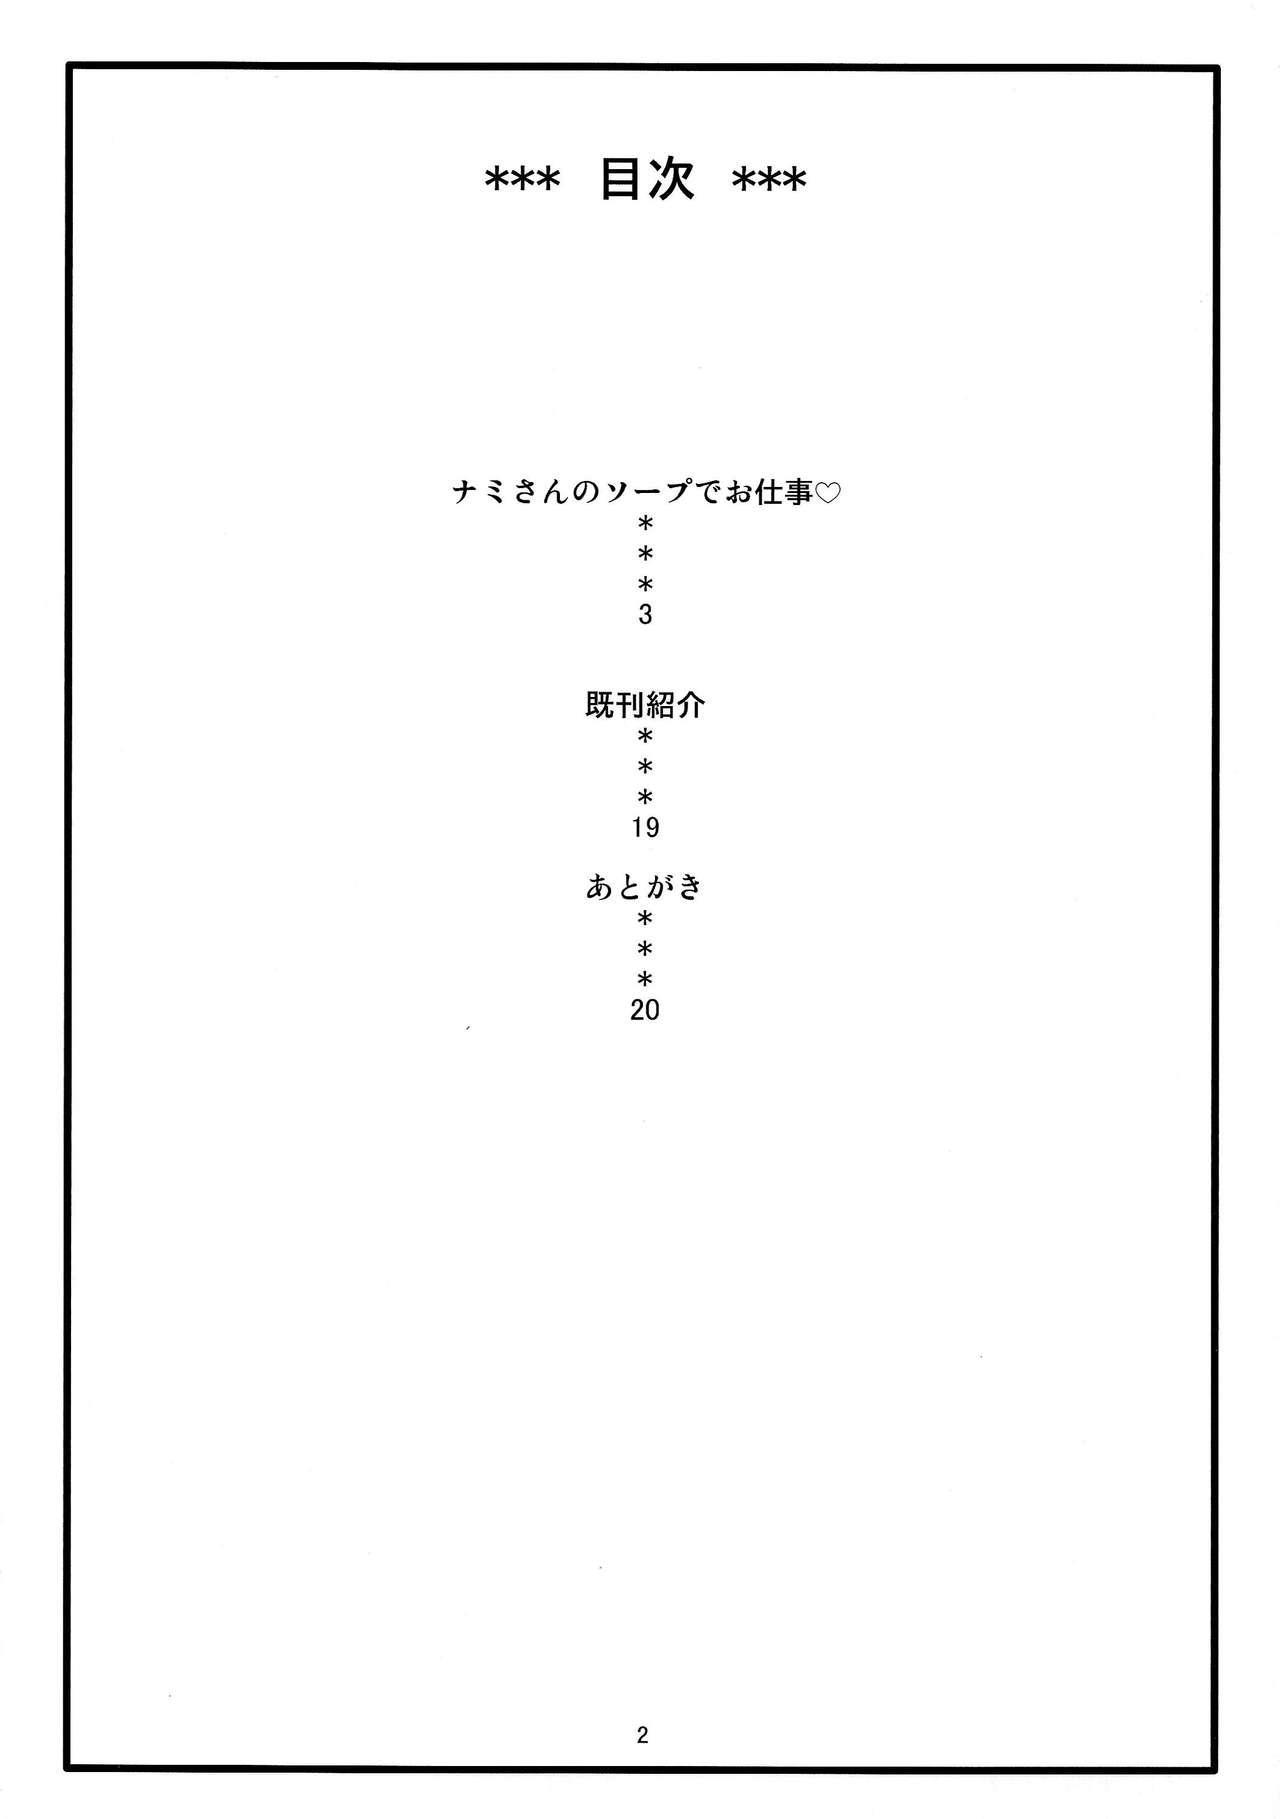 Nami no Ura Koukai Nisshi 8   Nami's Hidden Sailing Diary 8 2